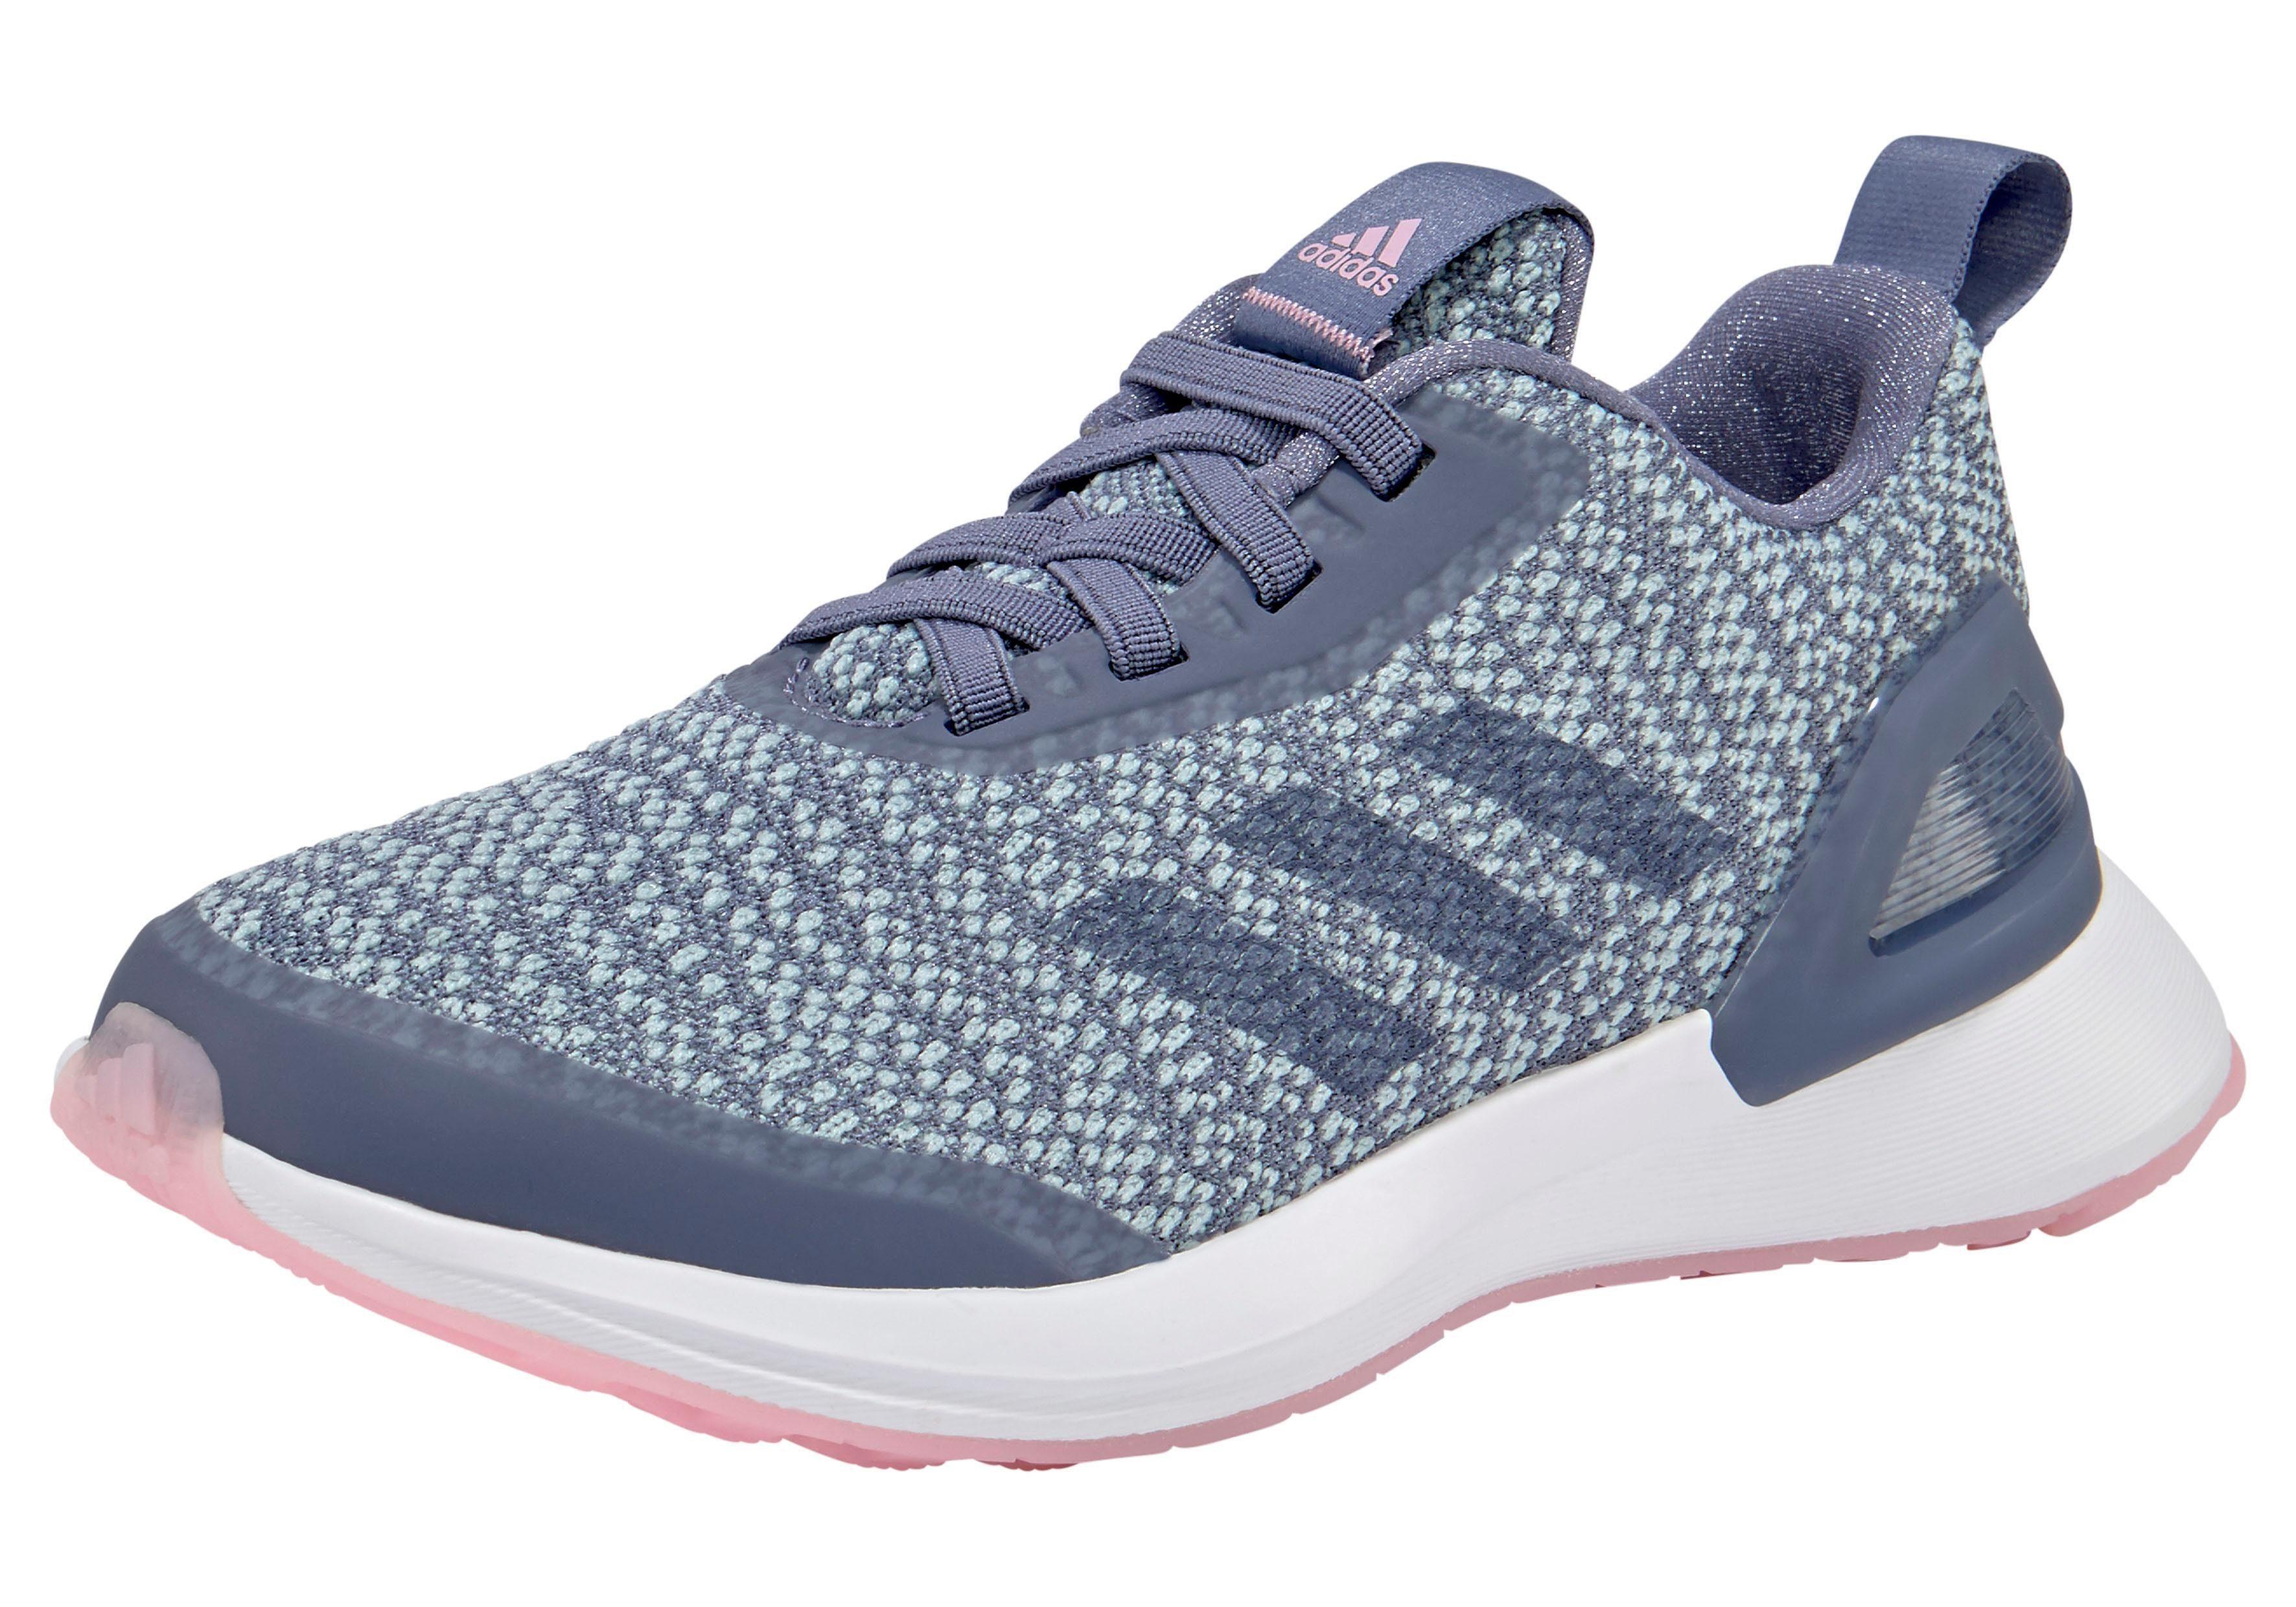 adidas RapidaRun X Shoe, adidas Sneakers Mädchen Raw Indigo